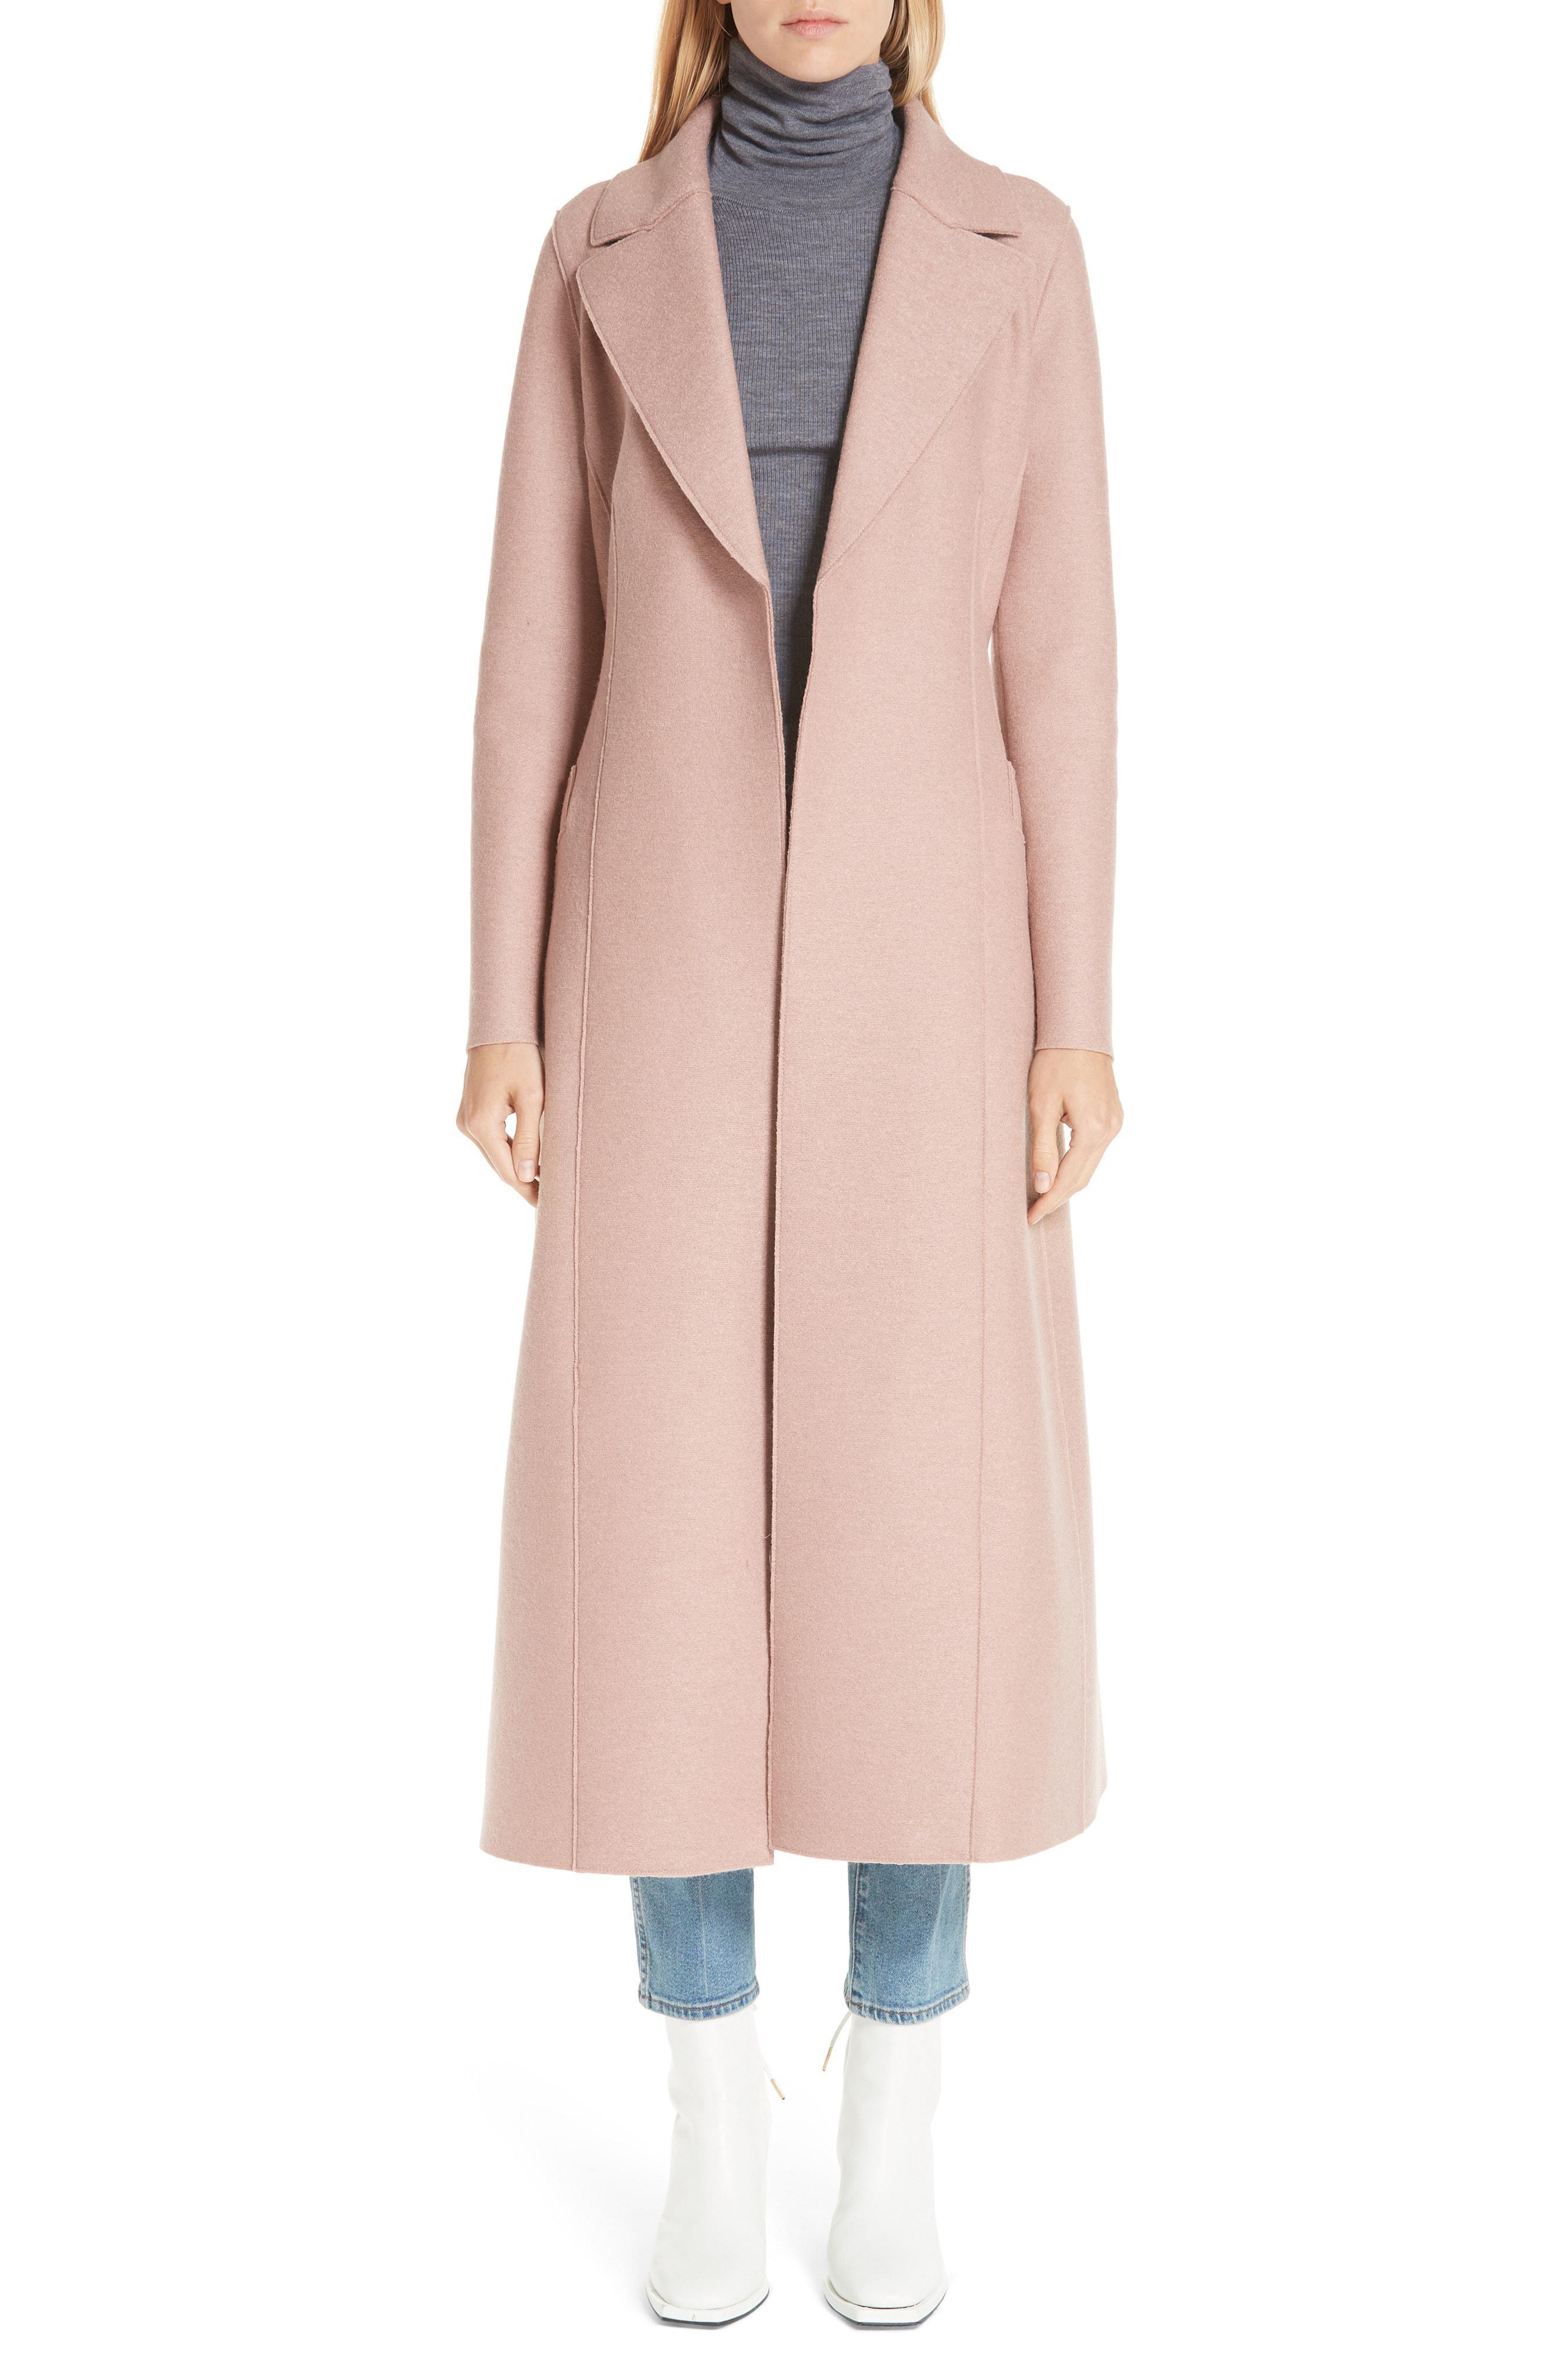 3c06bff9929b6 Lyst - Harris Wharf London Long Wool Duster Coat in Natural